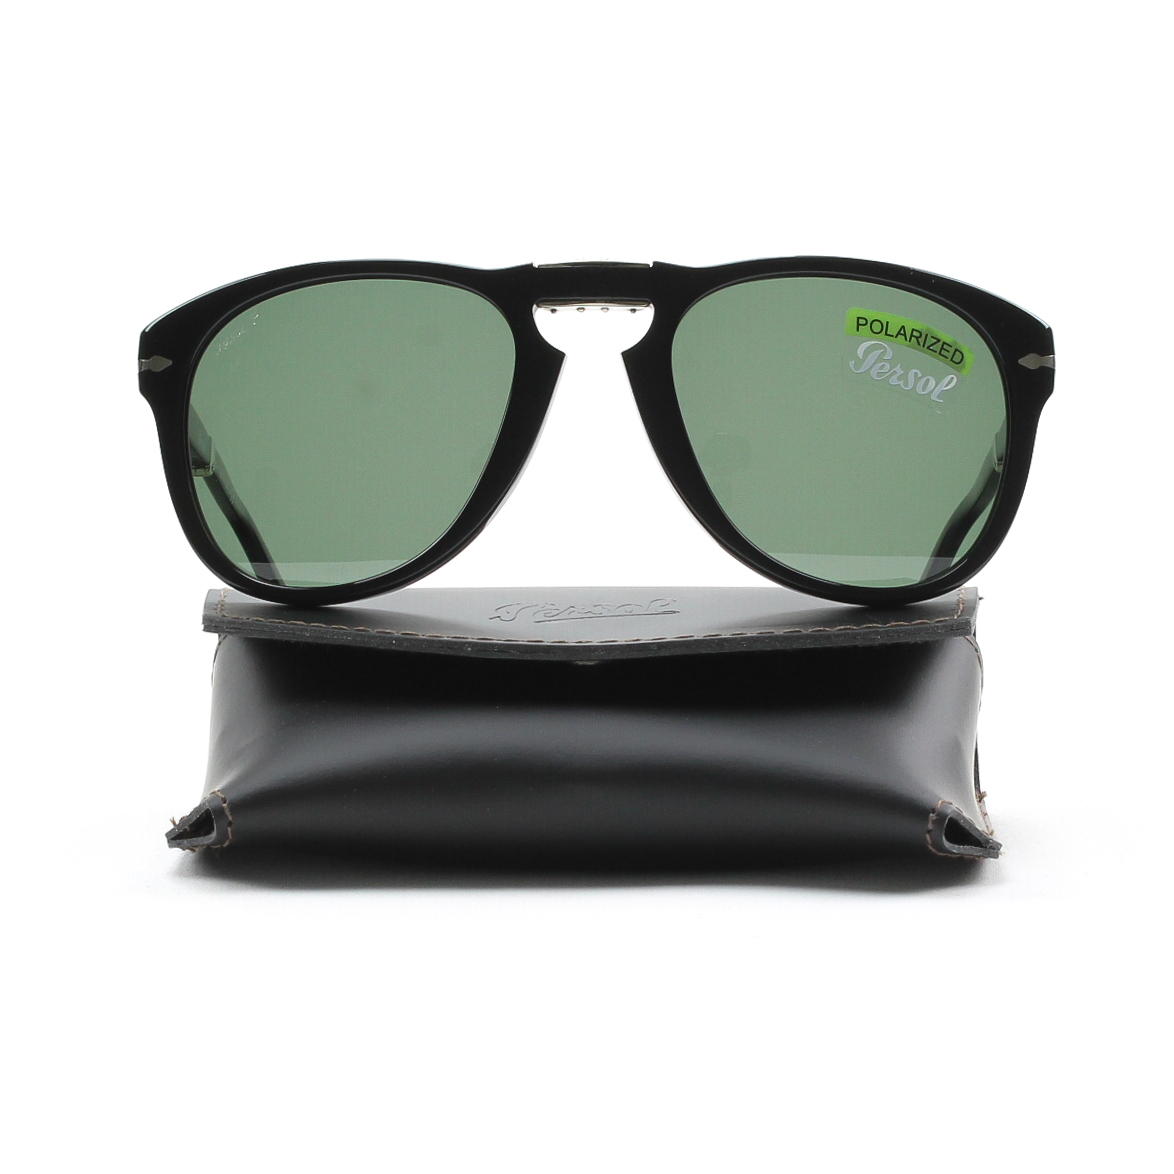 7669da9bb0b39 Persol - PO 714 95 58 54mm Shiny Black Green Polarized Folding Sunglasses -  Walmart.com